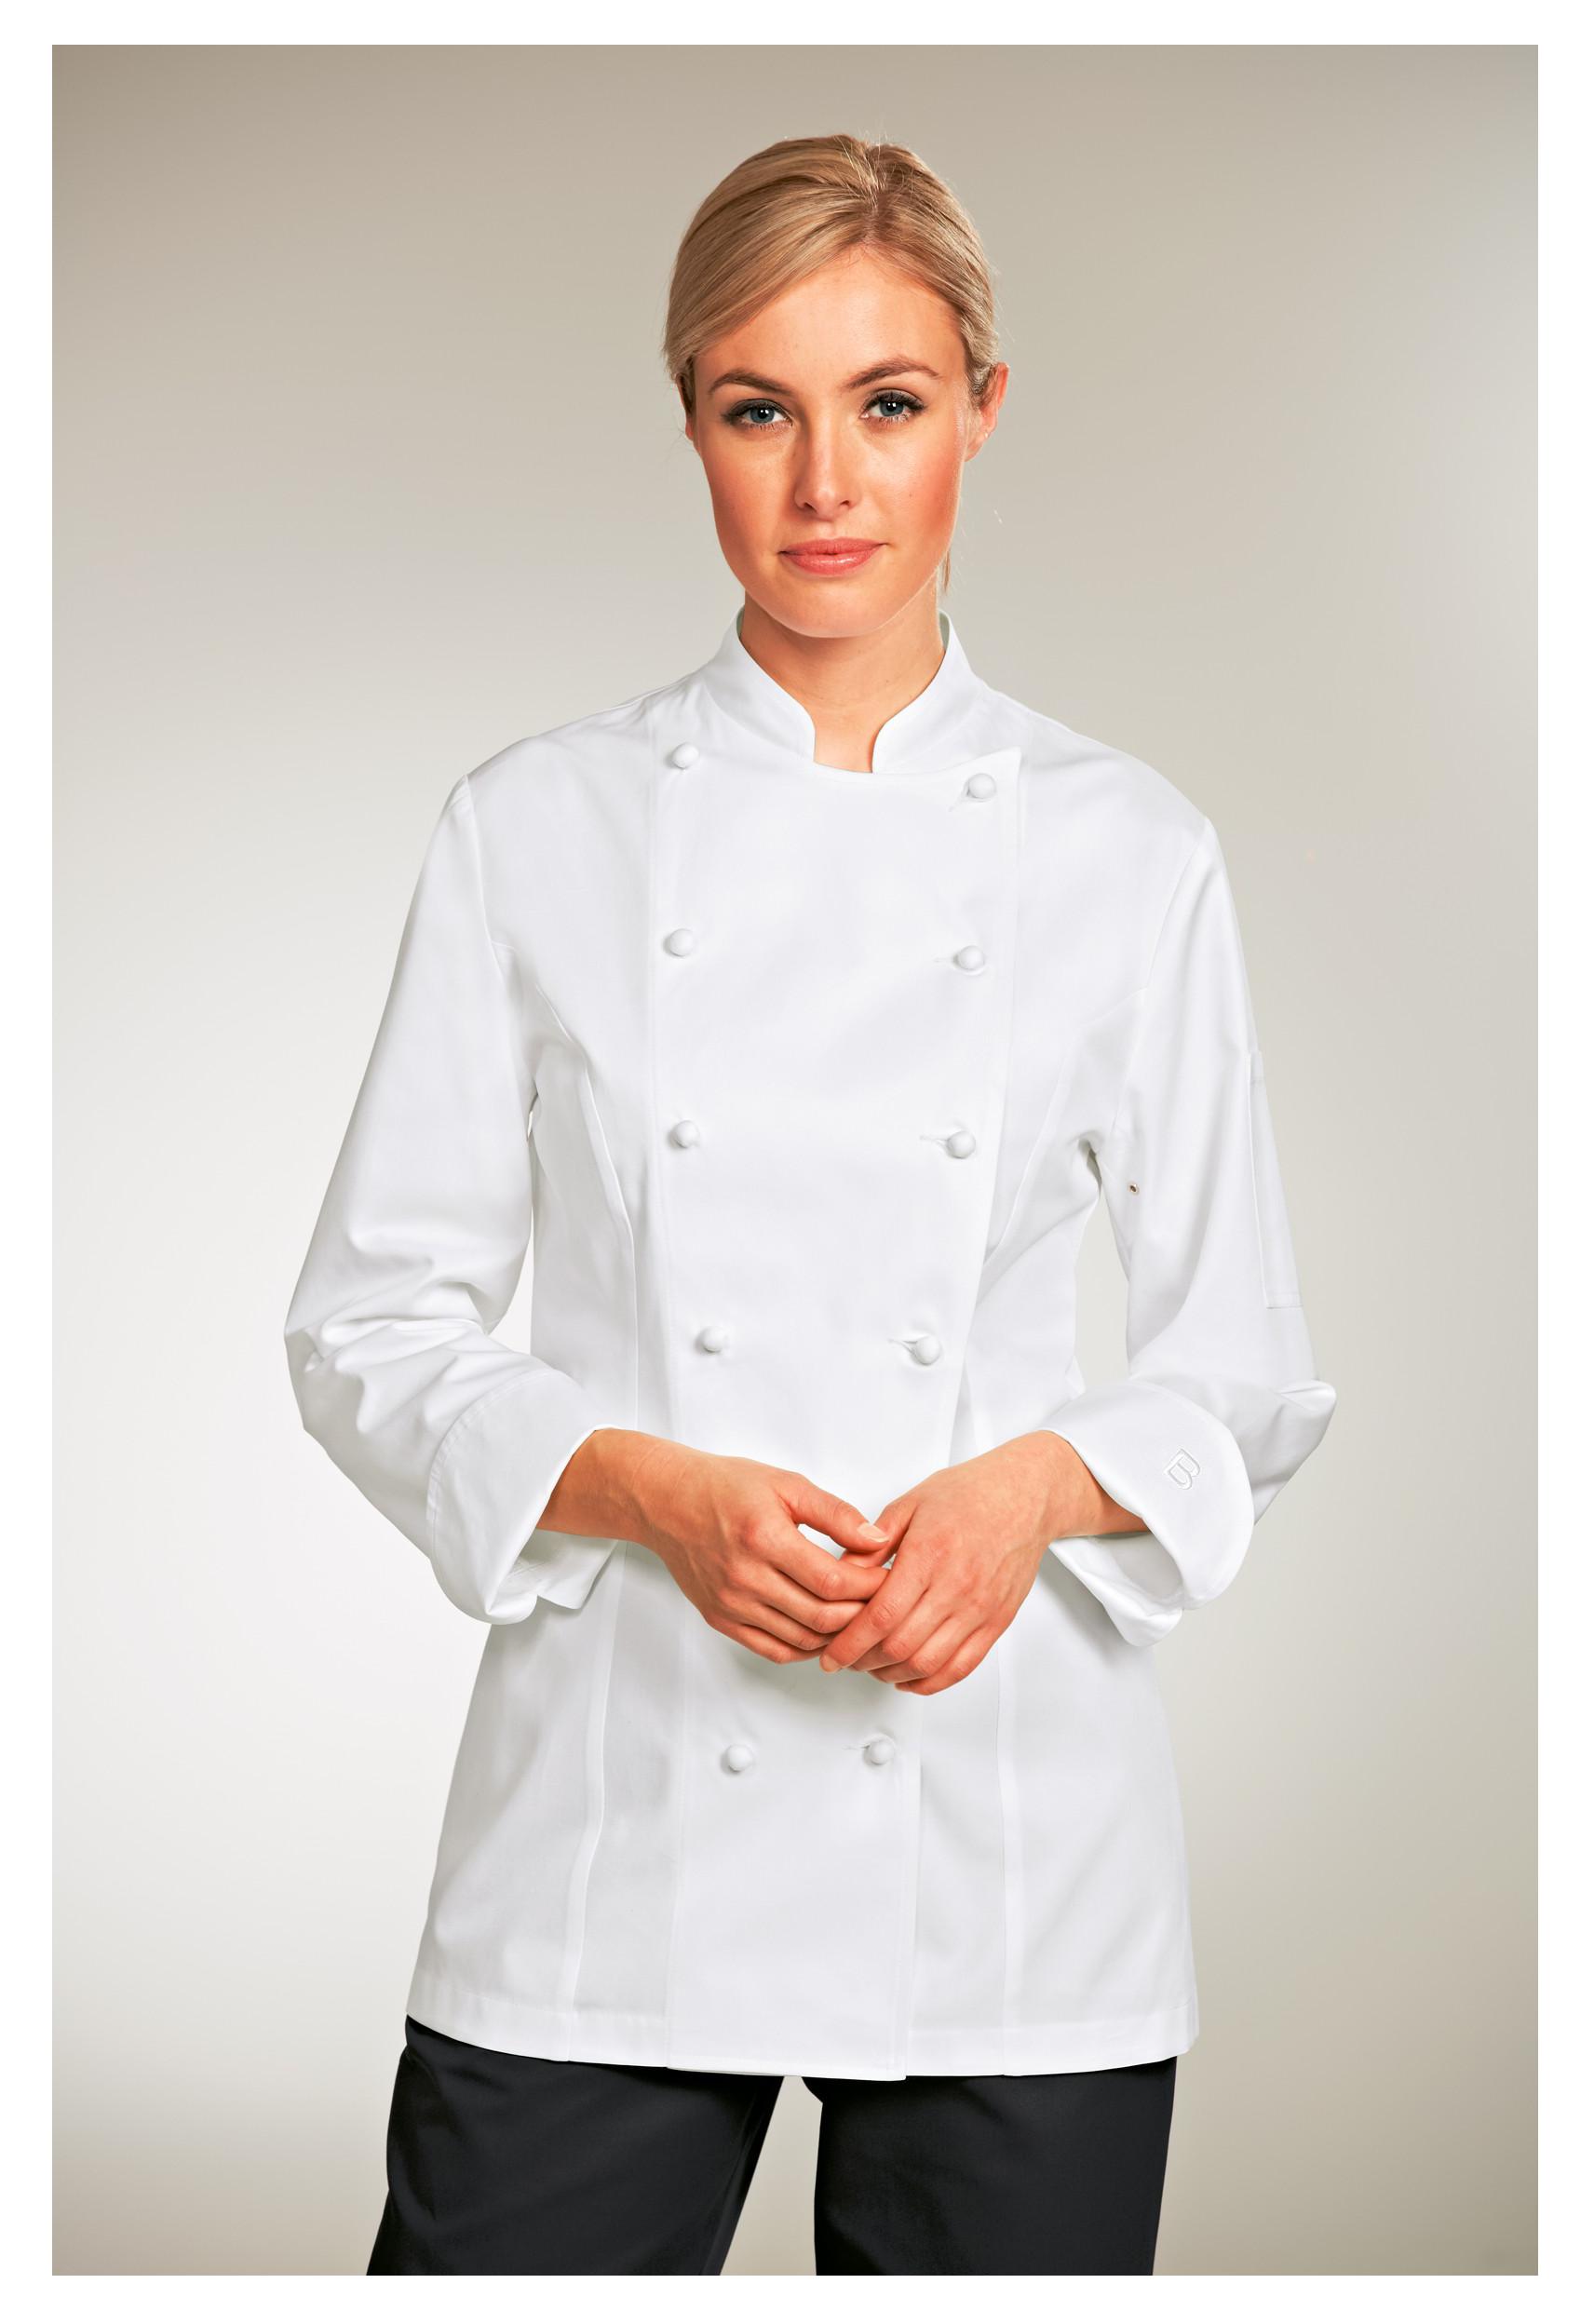 chaqueta de cocinero manga larga mujer